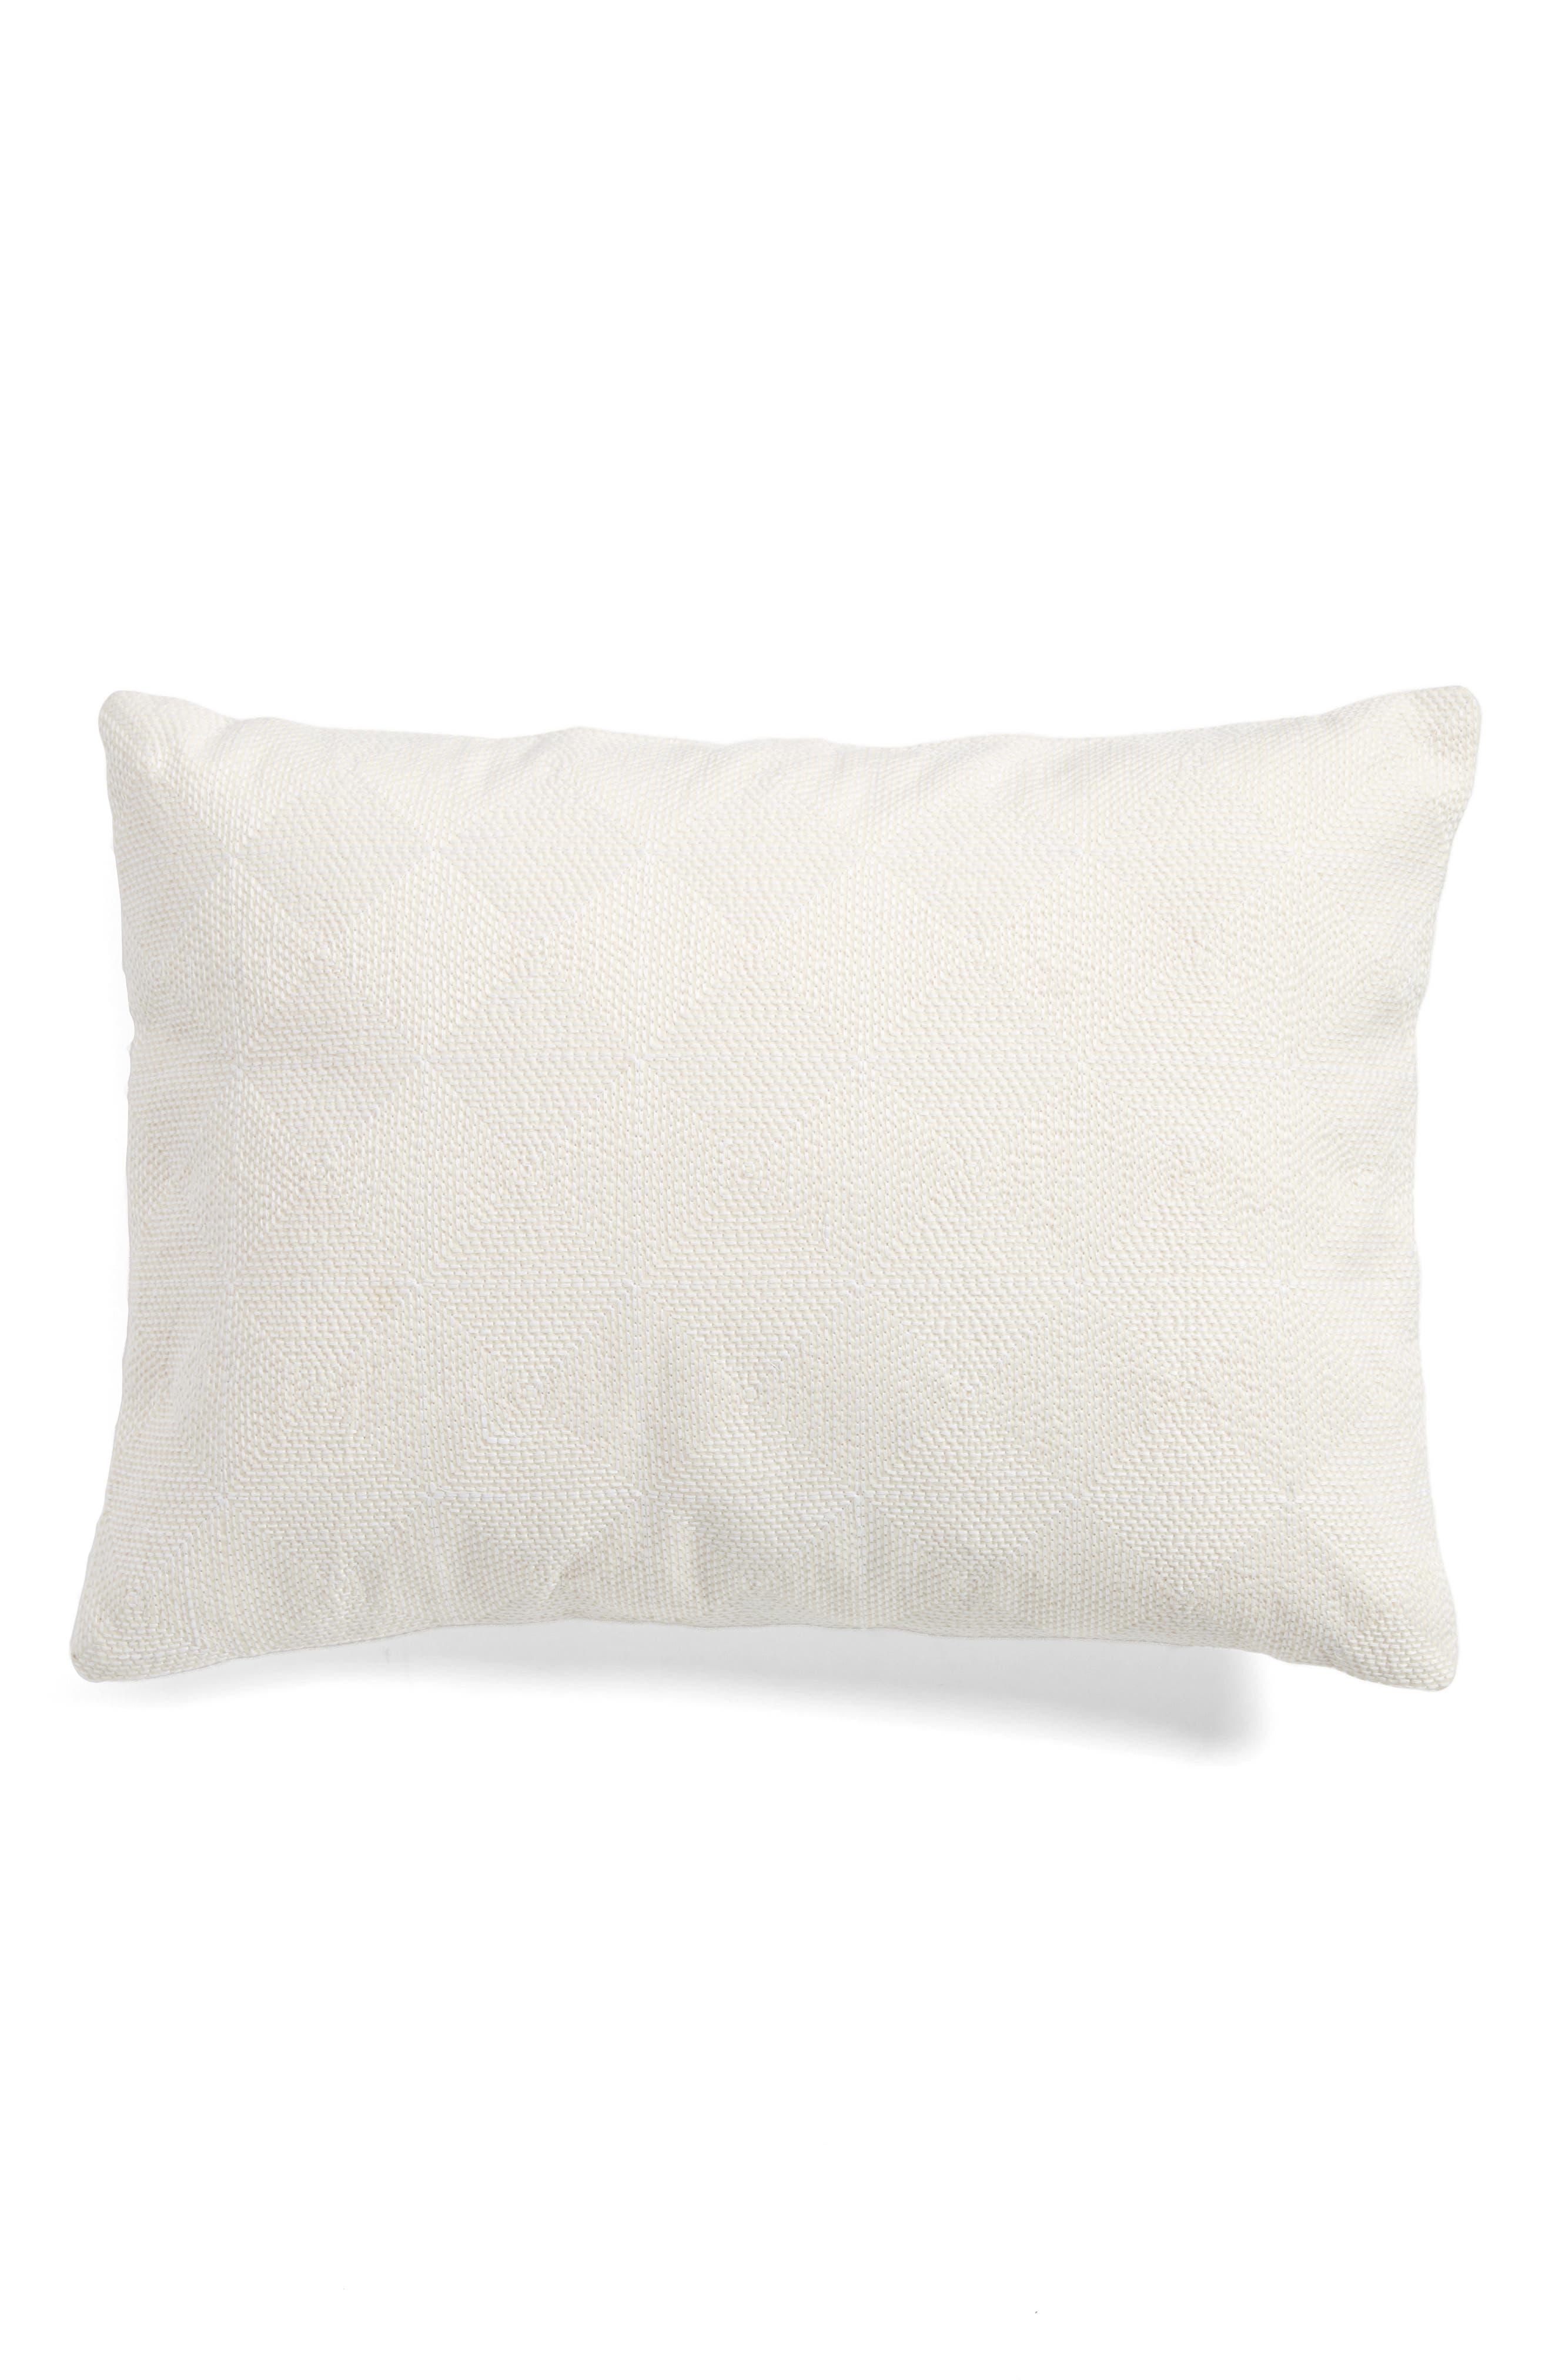 Fretwork Breakfast Pillow,                         Main,                         color, Cream